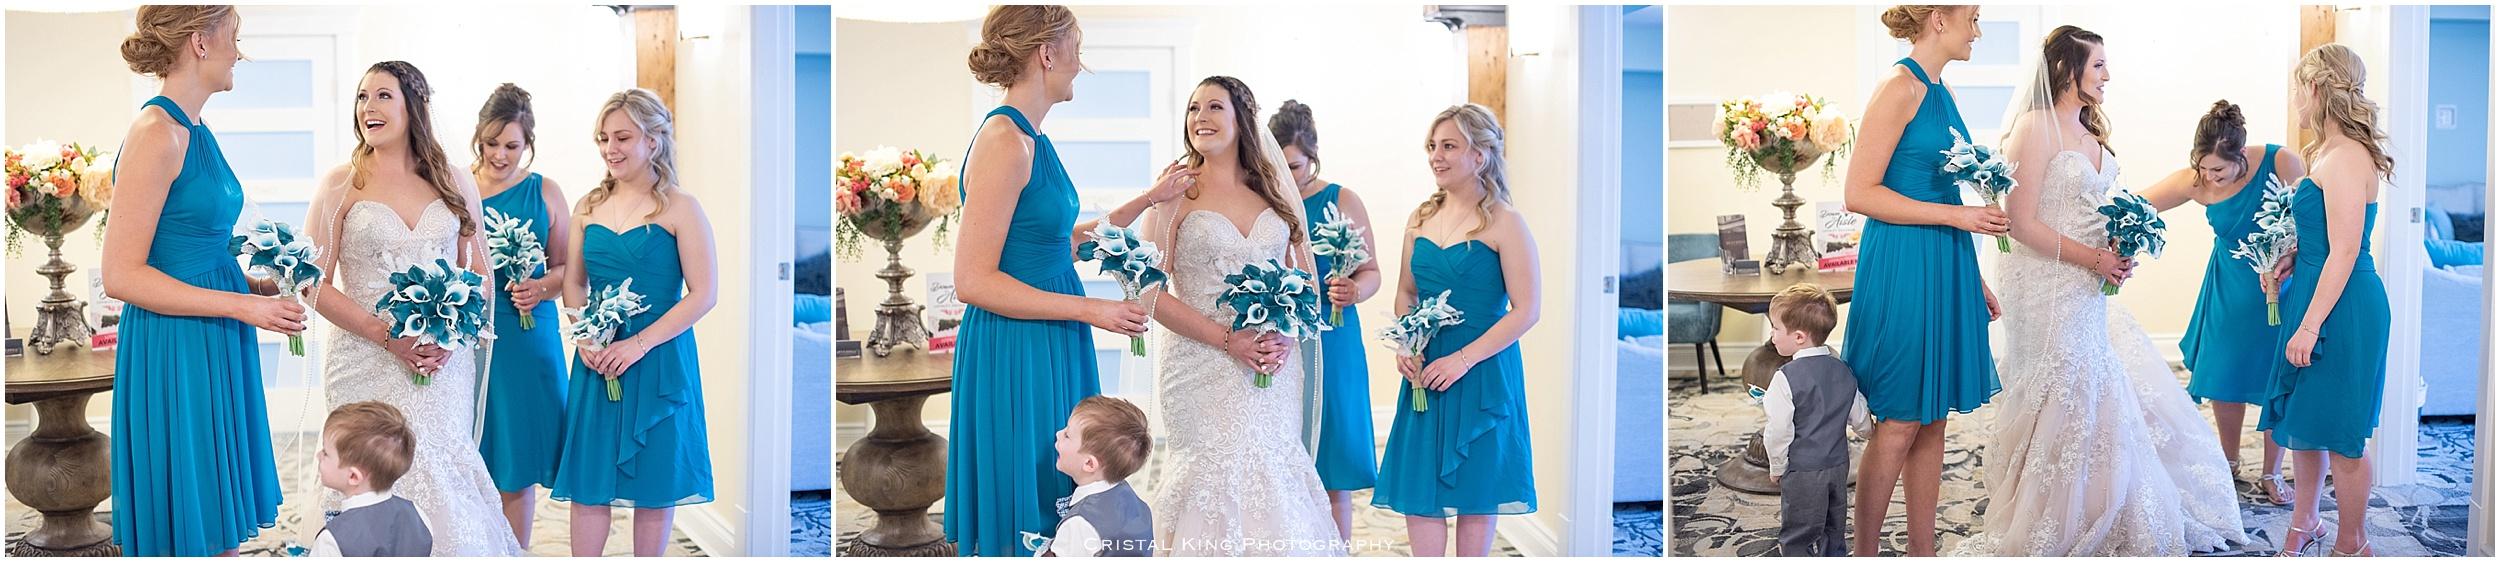 Myla & Grant Wedding-25.jpg